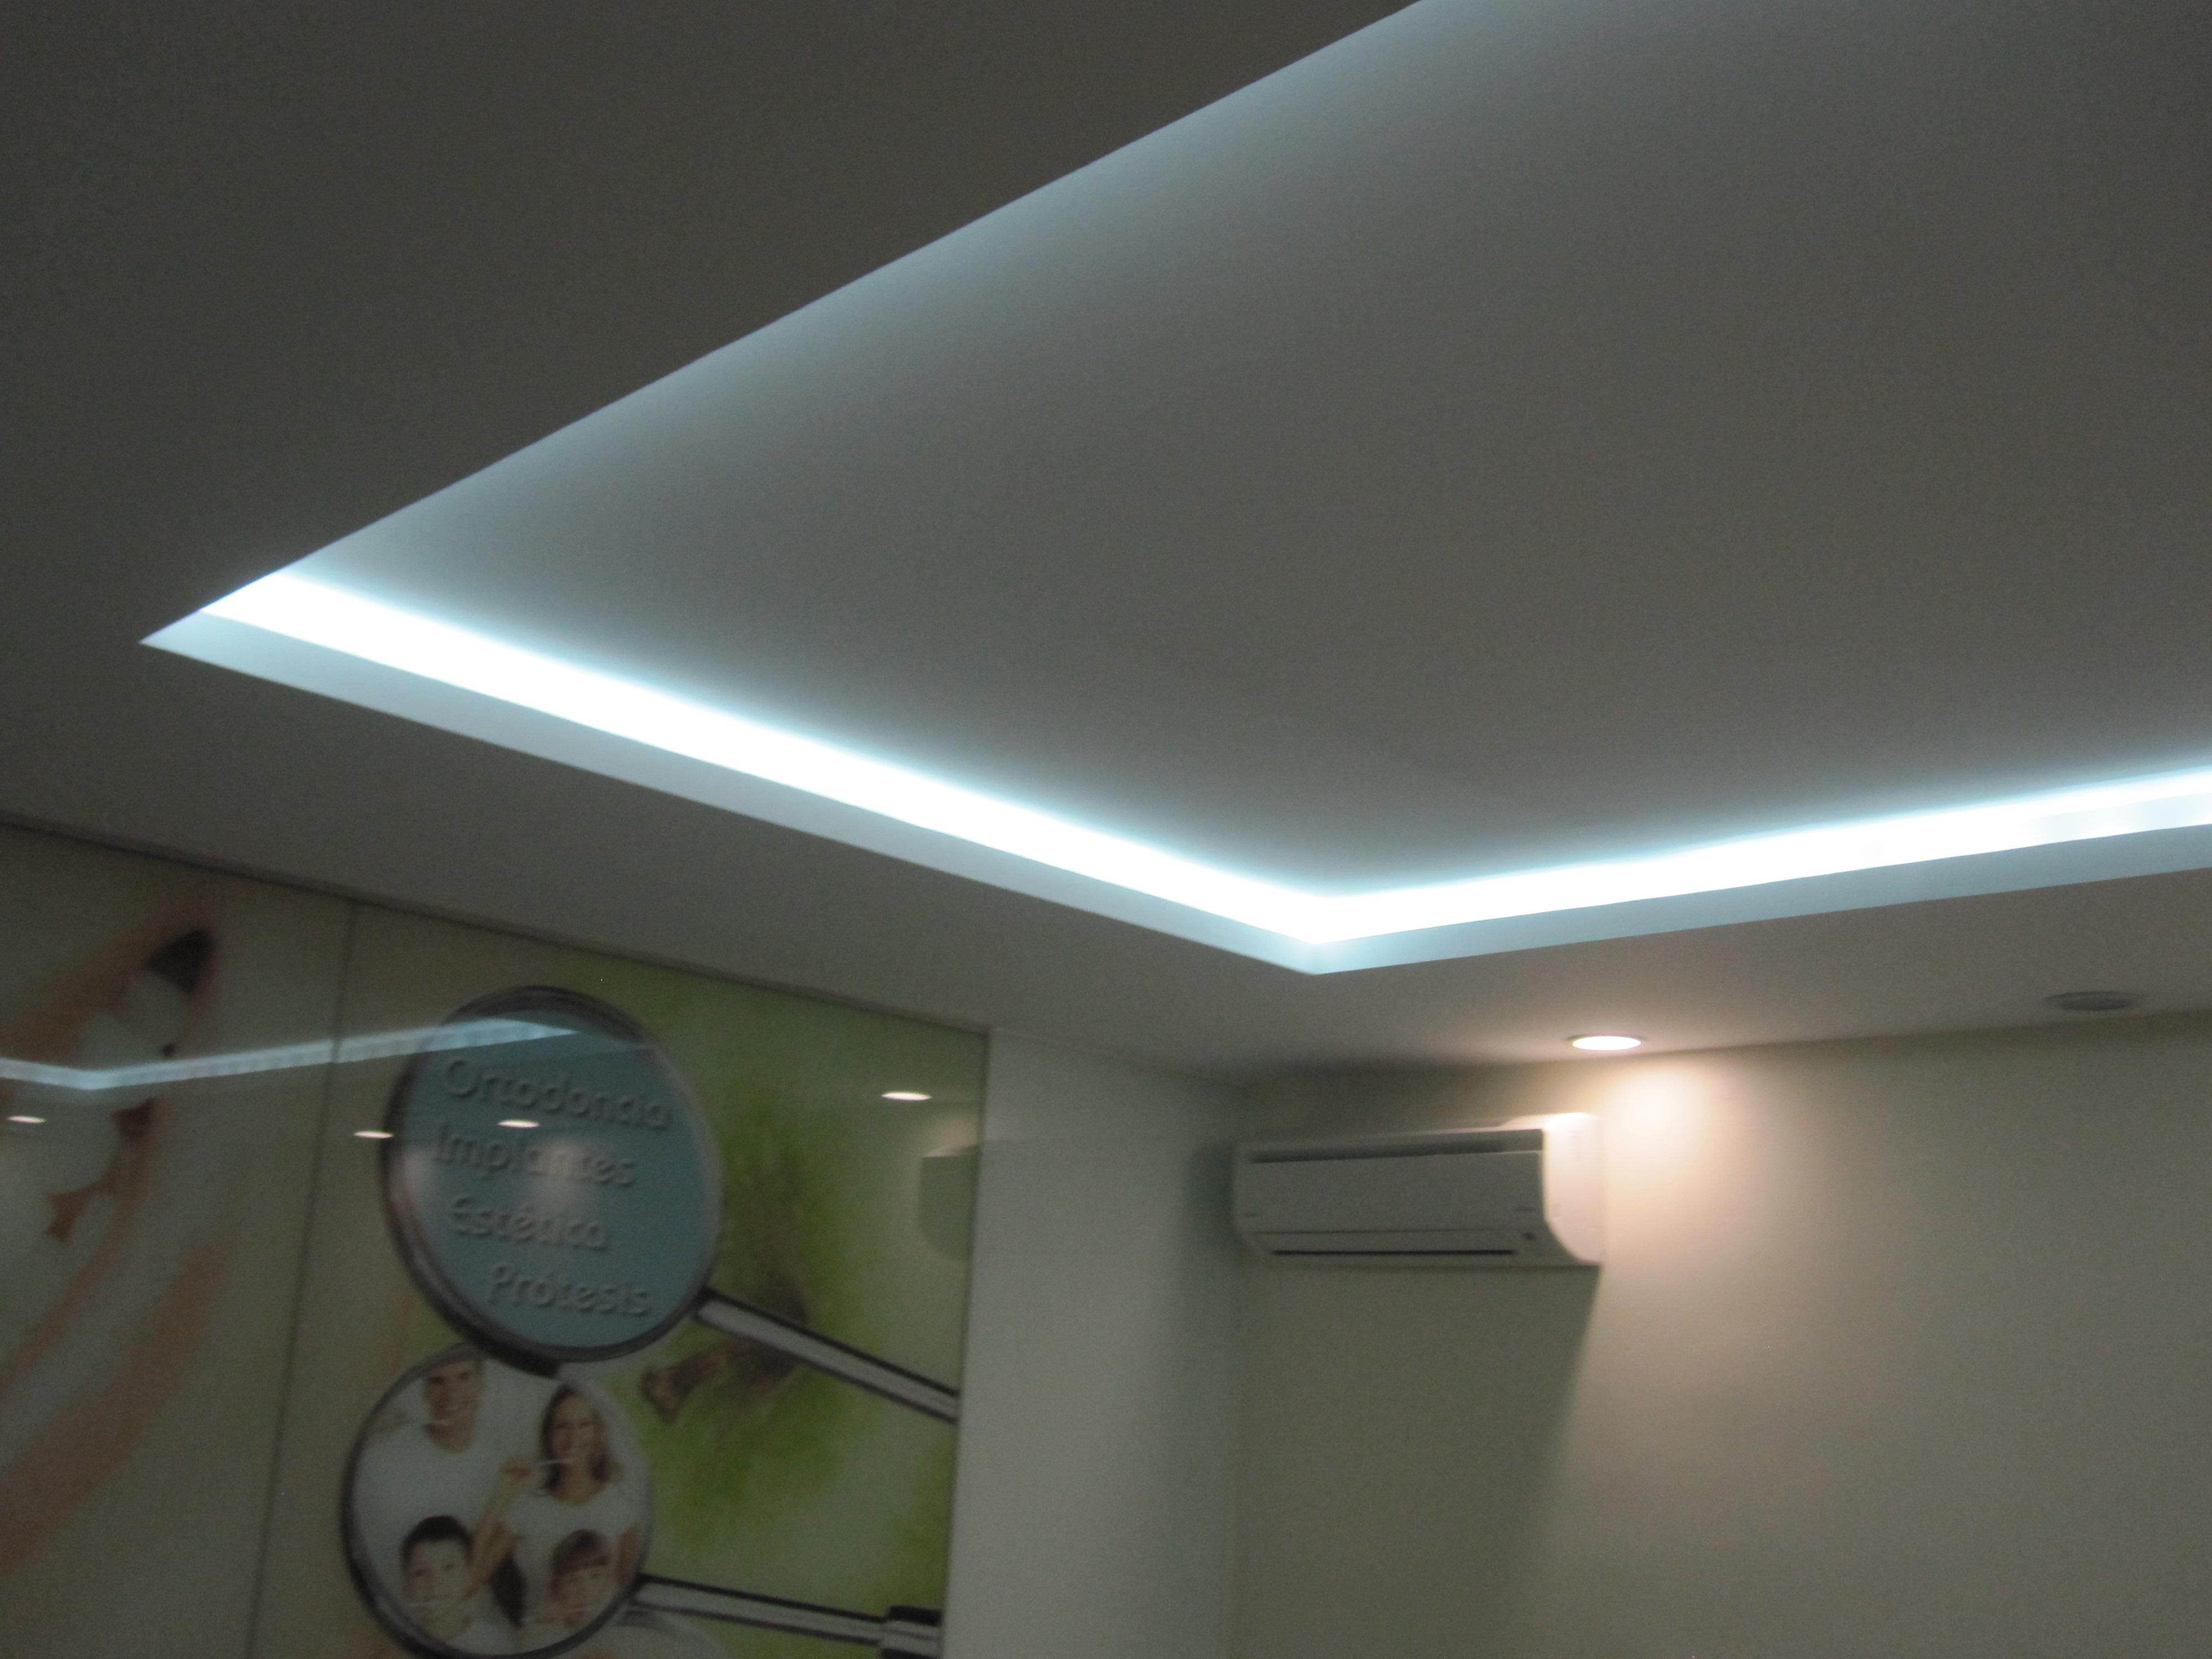 Iluminaci n en granada exteriores interiores comercial - Iluminacion led malaga ...